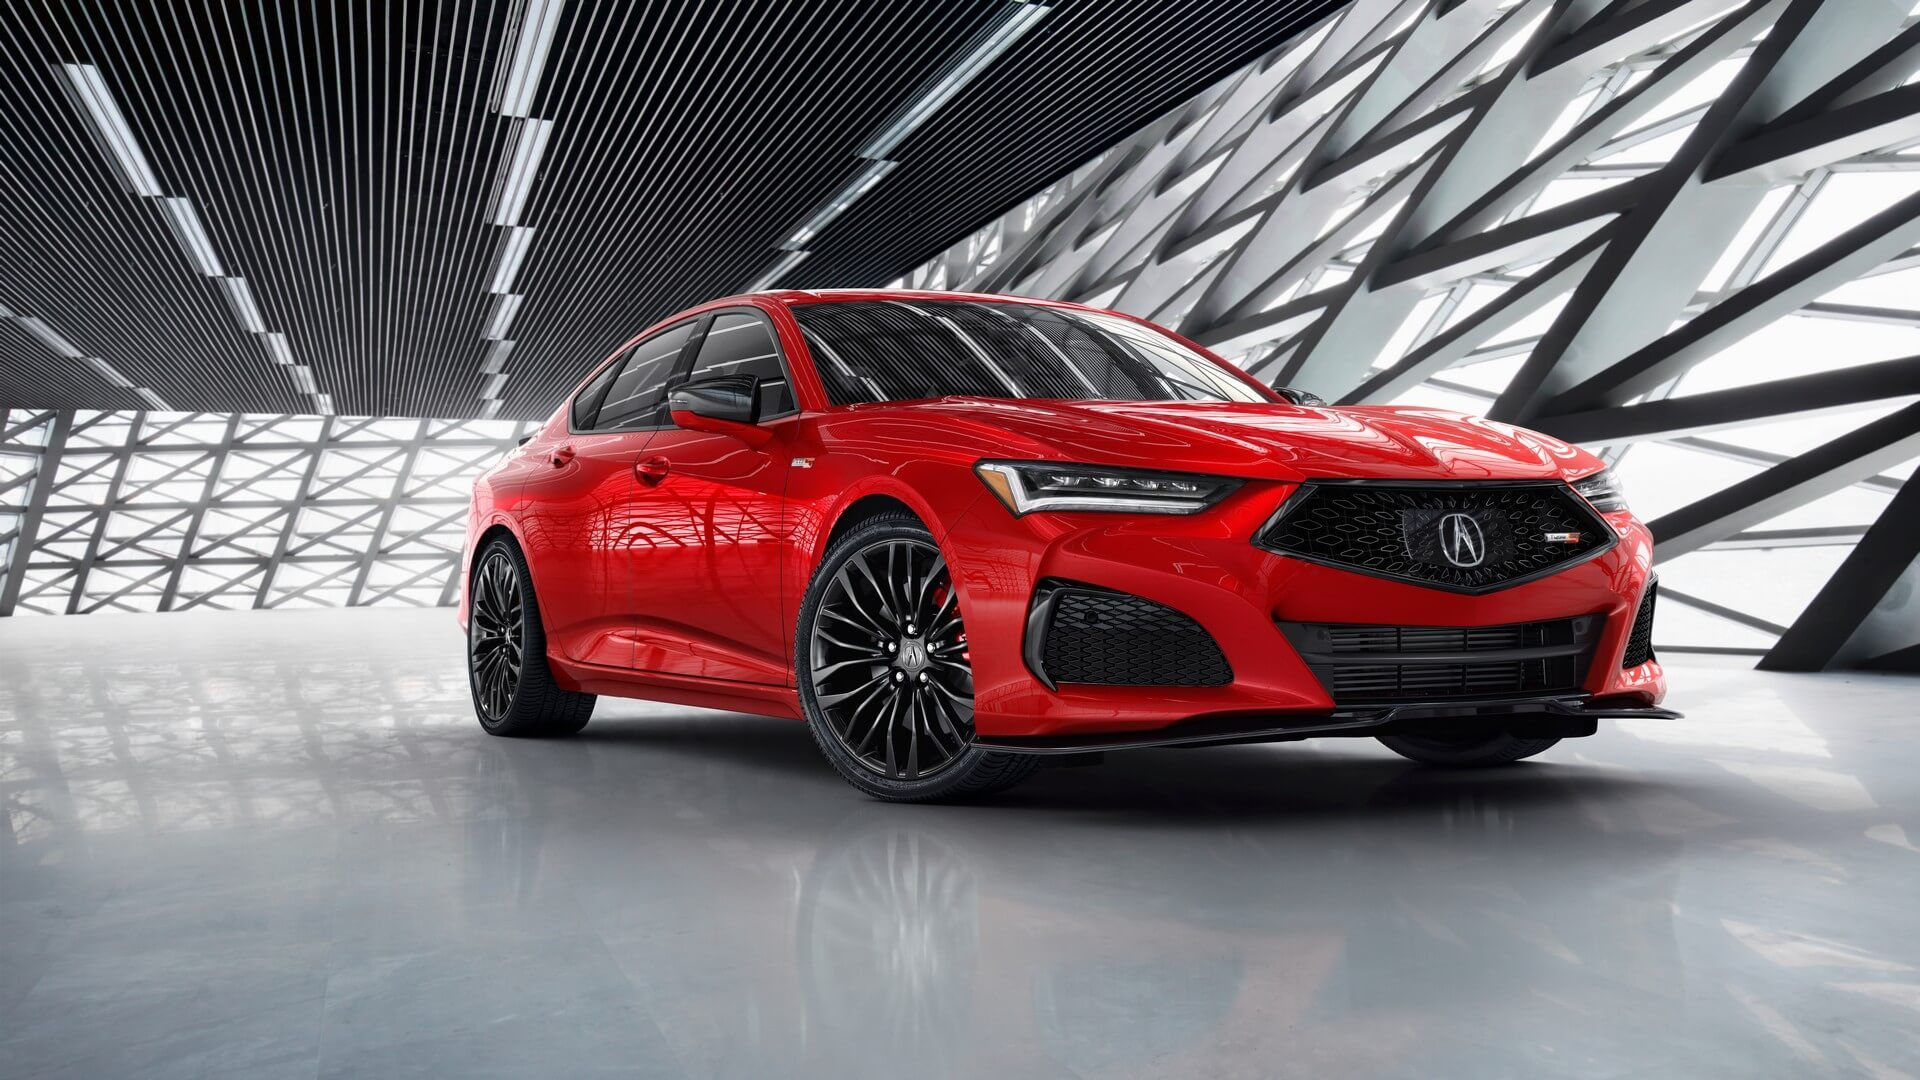 2021 Acura Tlx Type S And Audi S4 Specs Compared In 2020 Acura Tlx Acura Sedan Sports Sedan